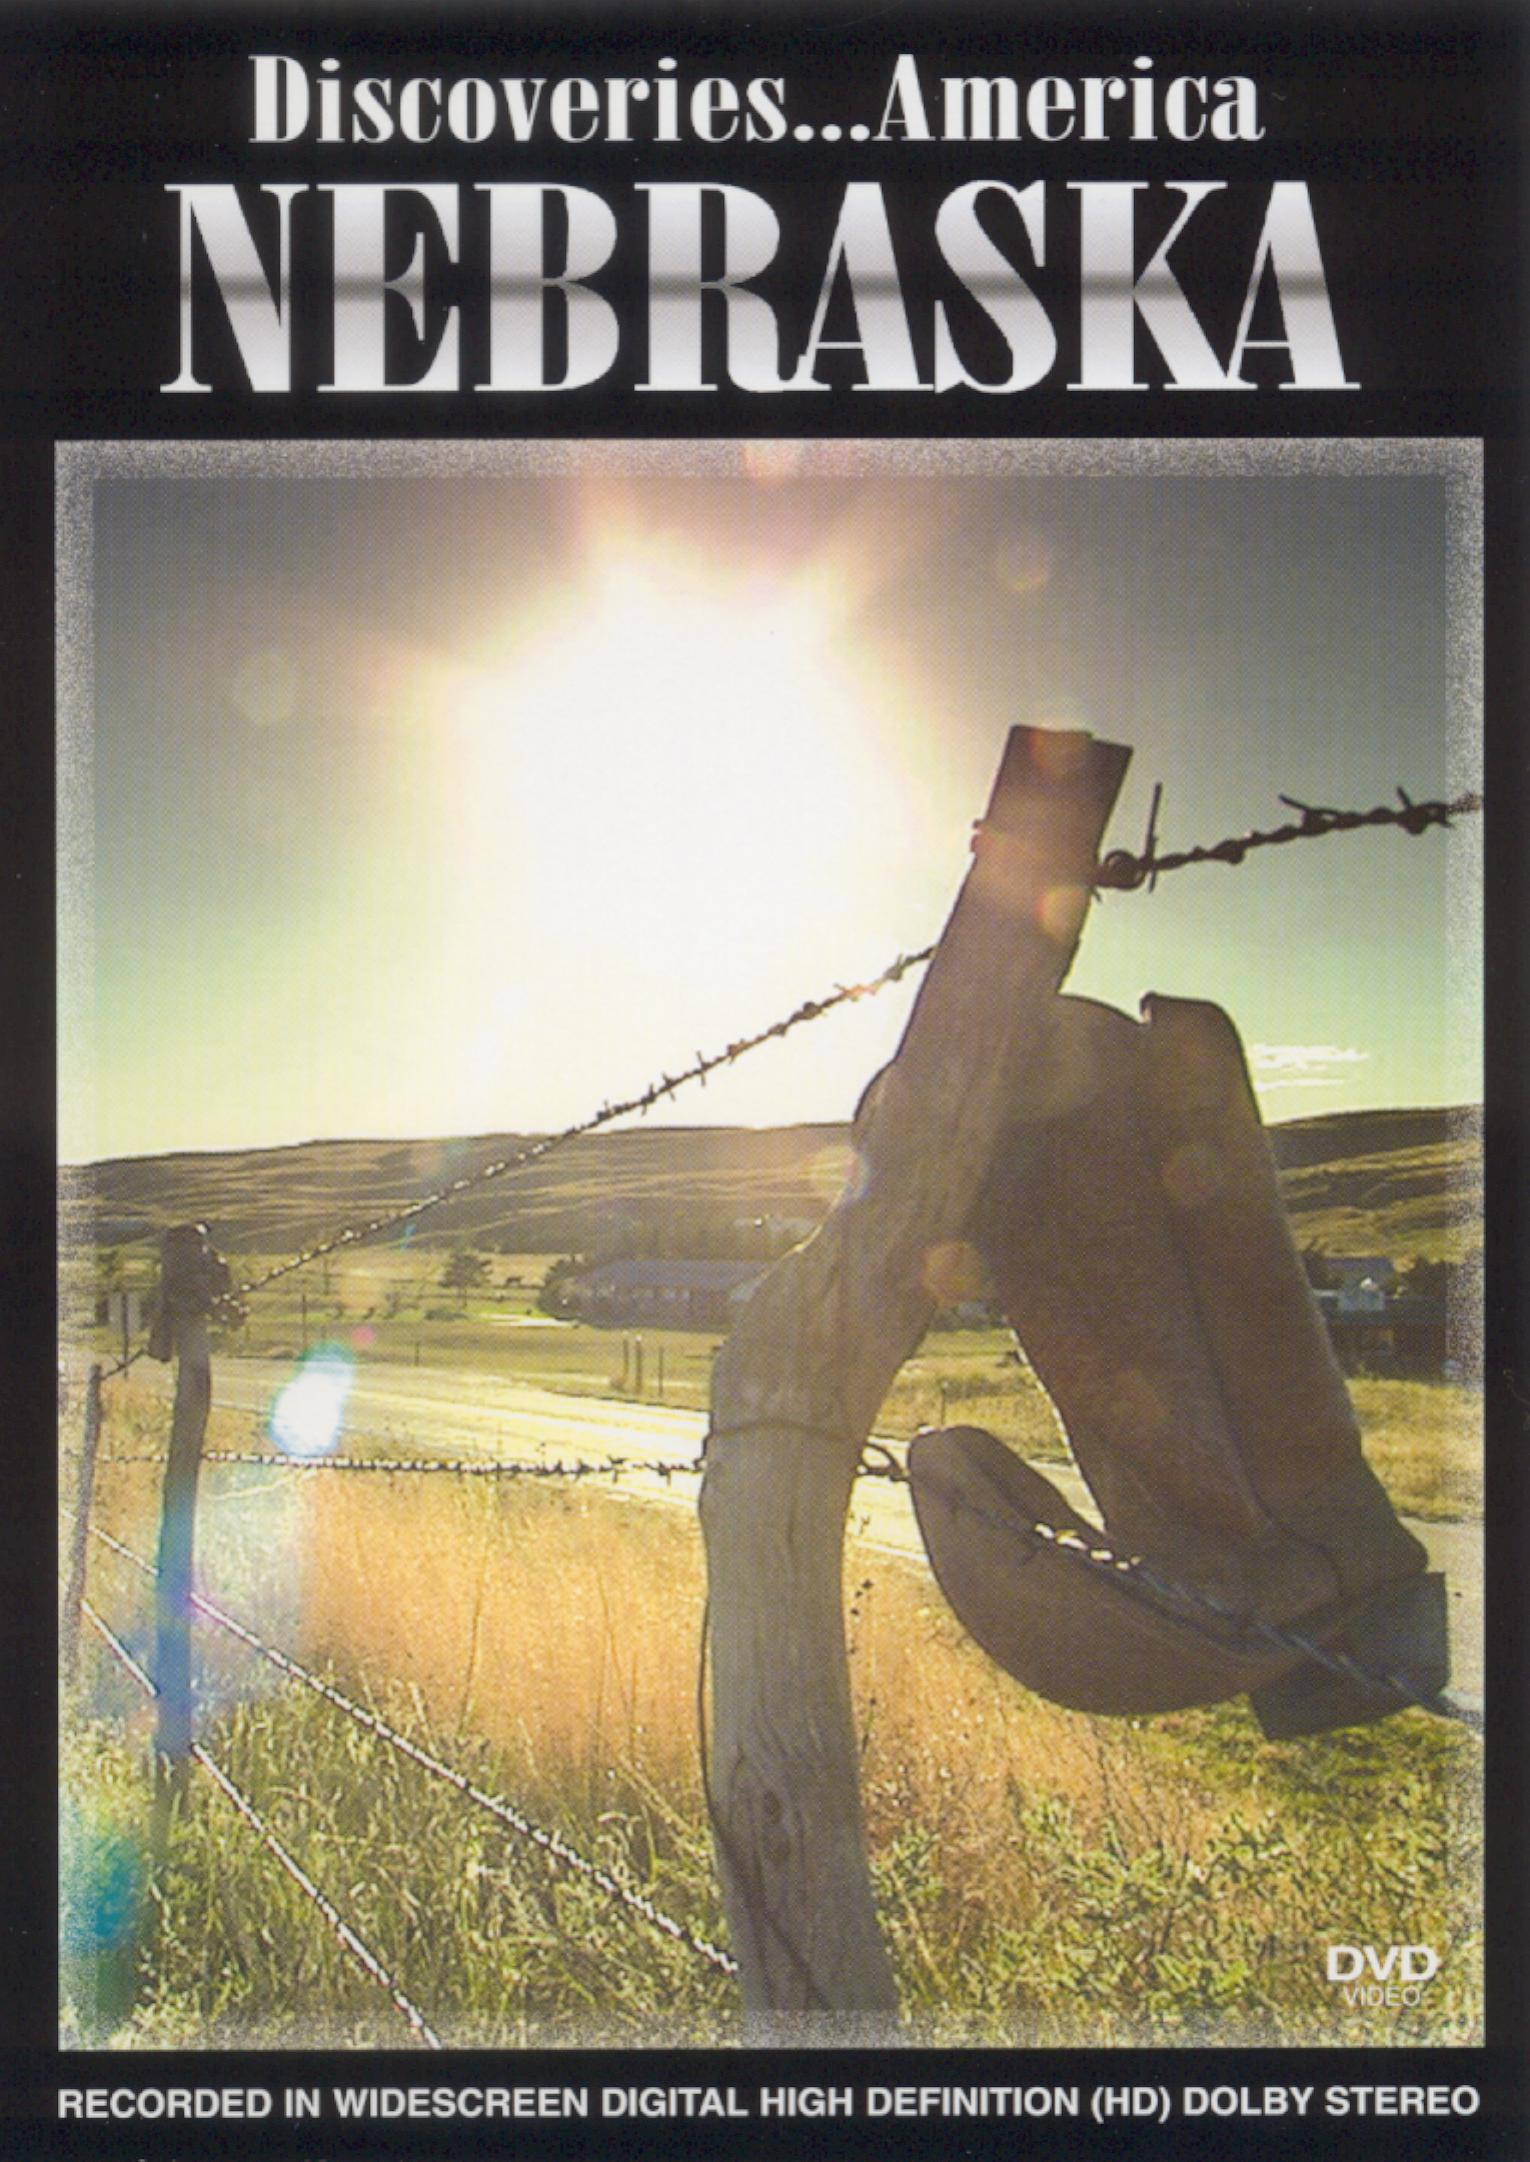 Discoveries... America: Nebraska